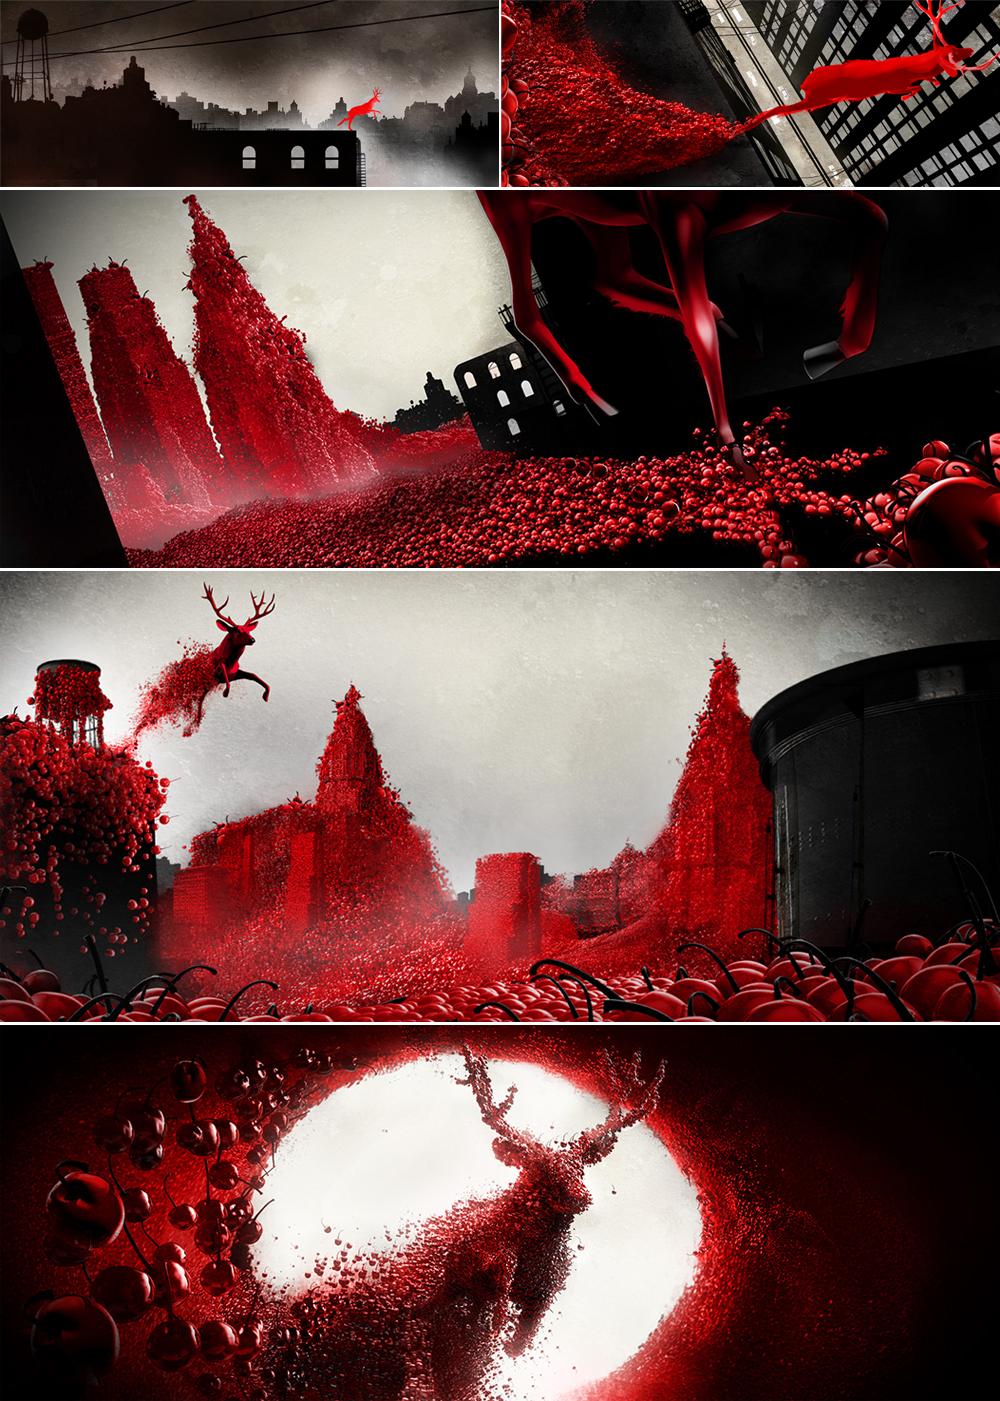 063017_JimBeam_Red_Storyboard01.png